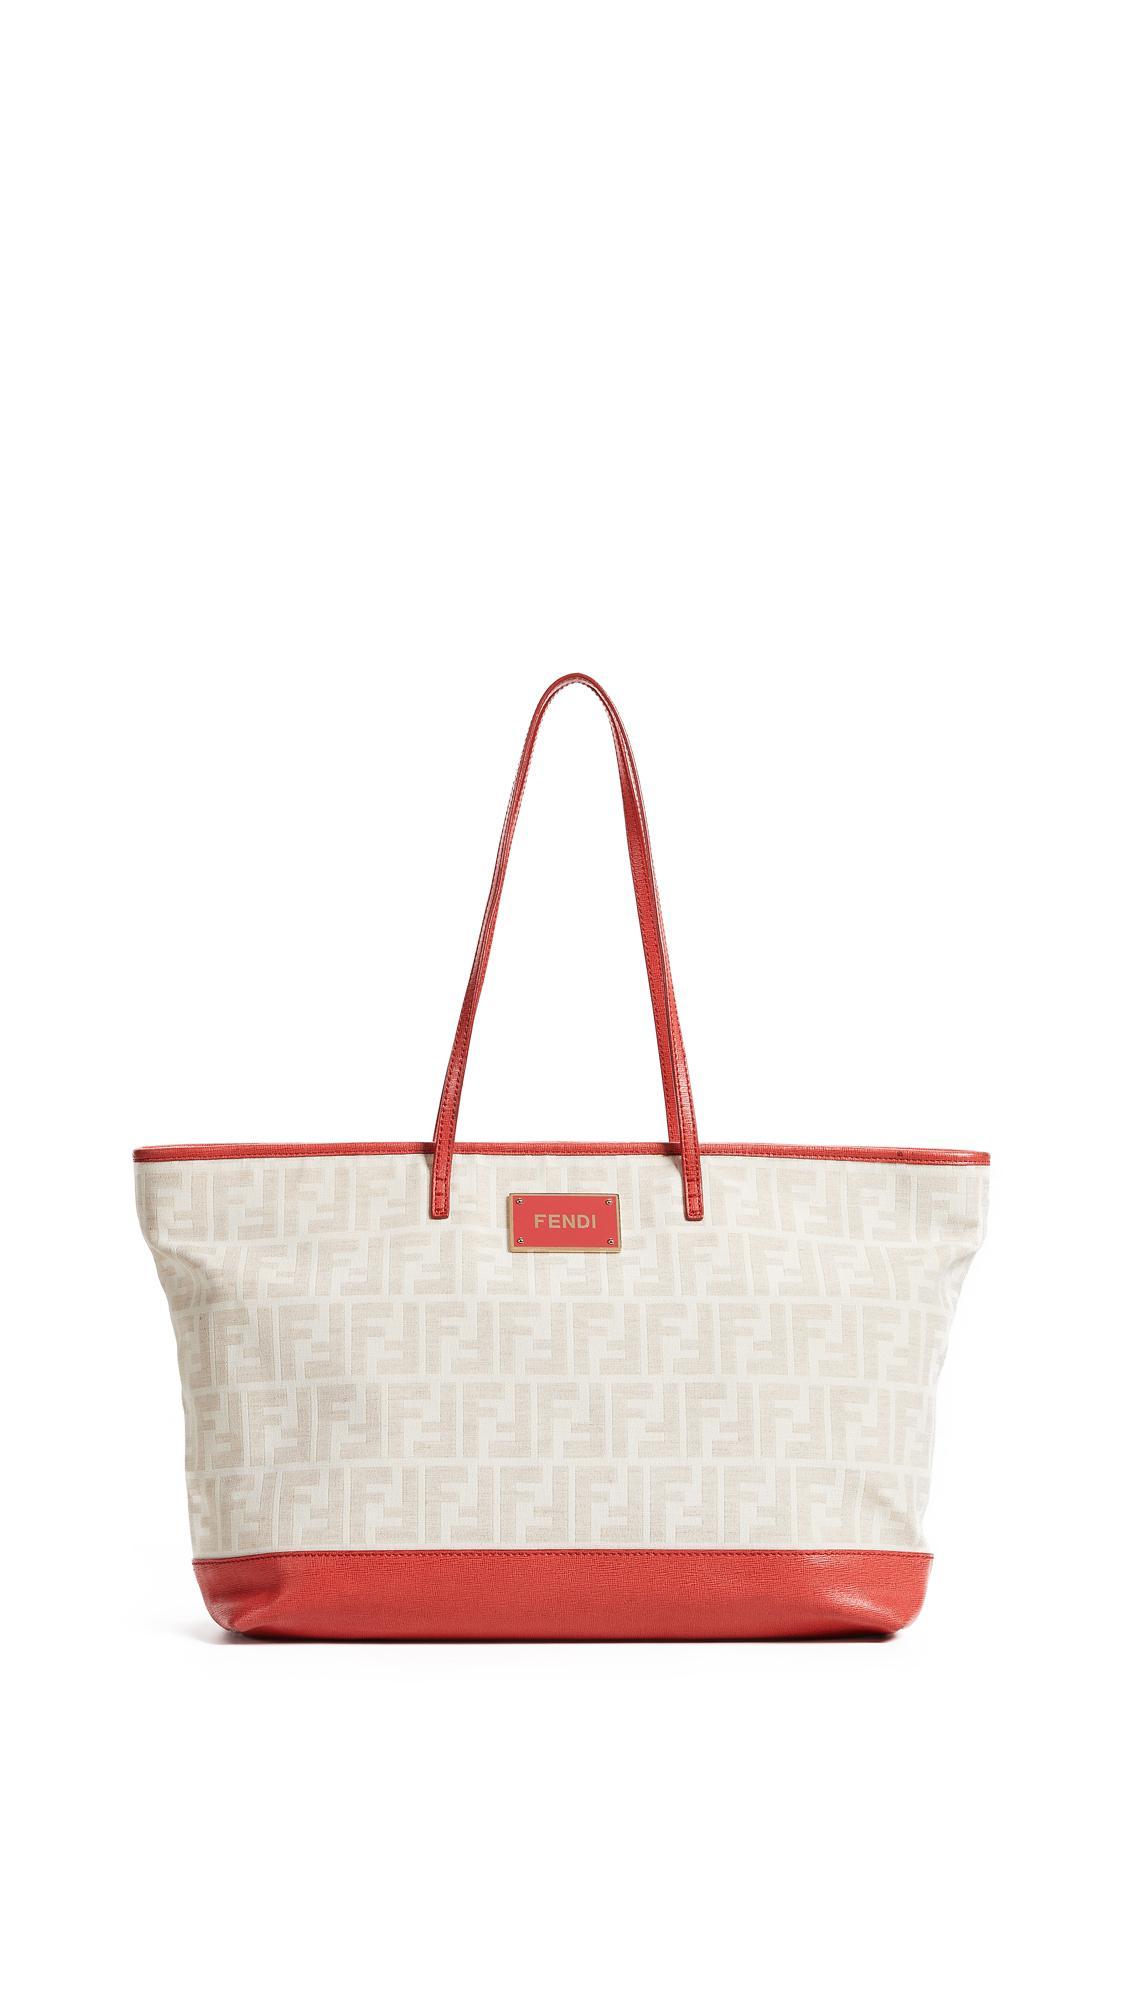 e2fcee638a Fendi Zucca Canvas Roll Tote Bag In Red | ModeSens